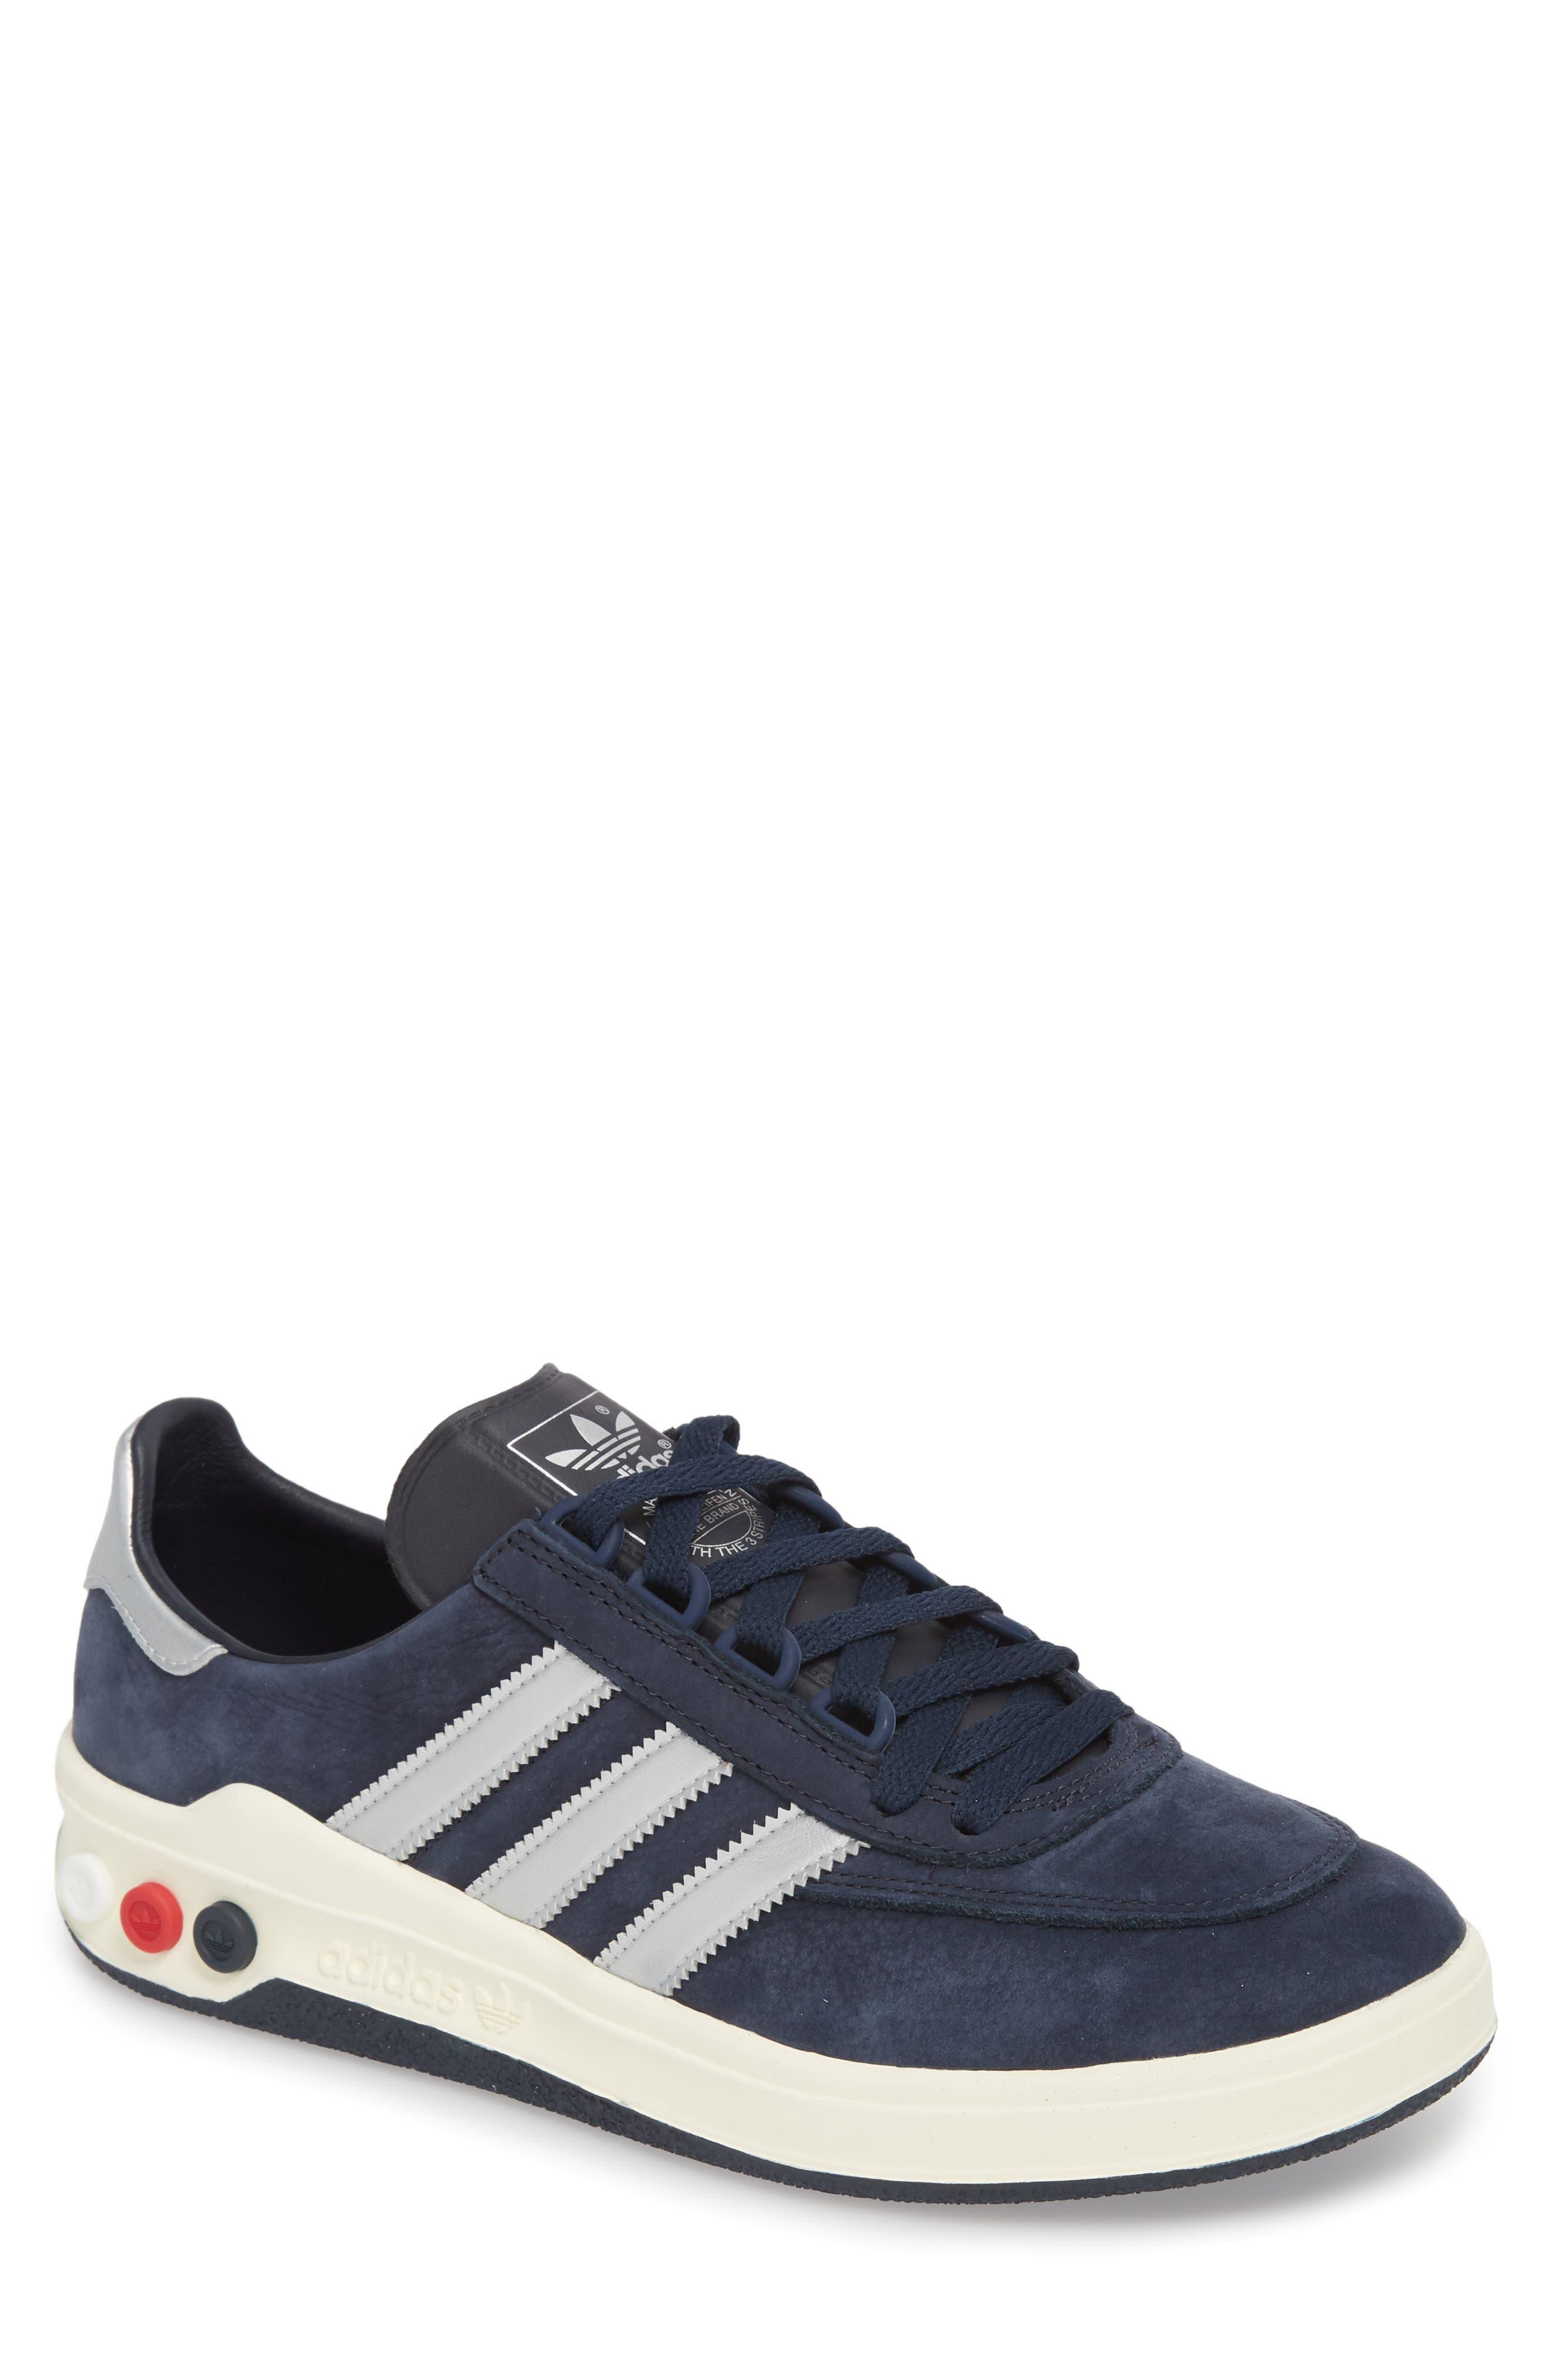 CLMBA SPZL Sneaker,                         Main,                         color, Night Navy/ Silver/ White